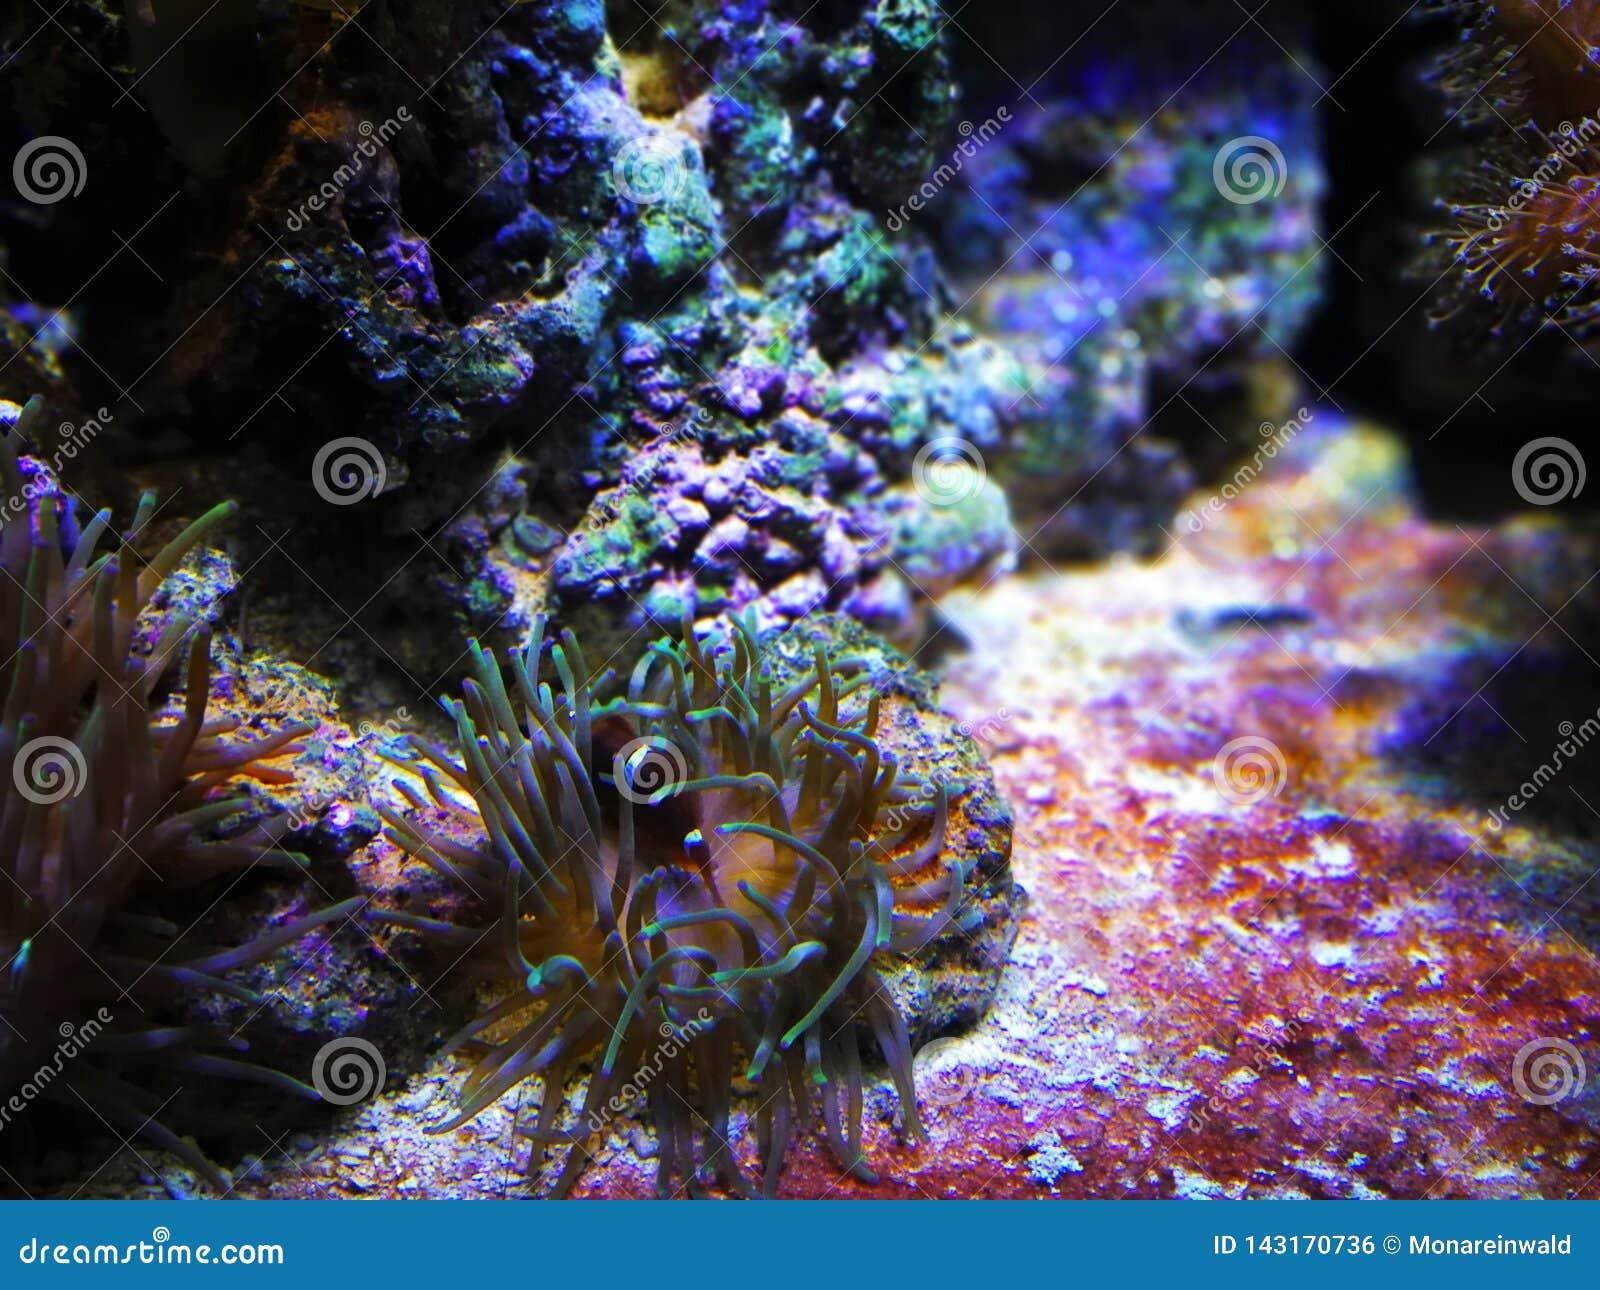 Unterwater世界在巴塞罗那在春天